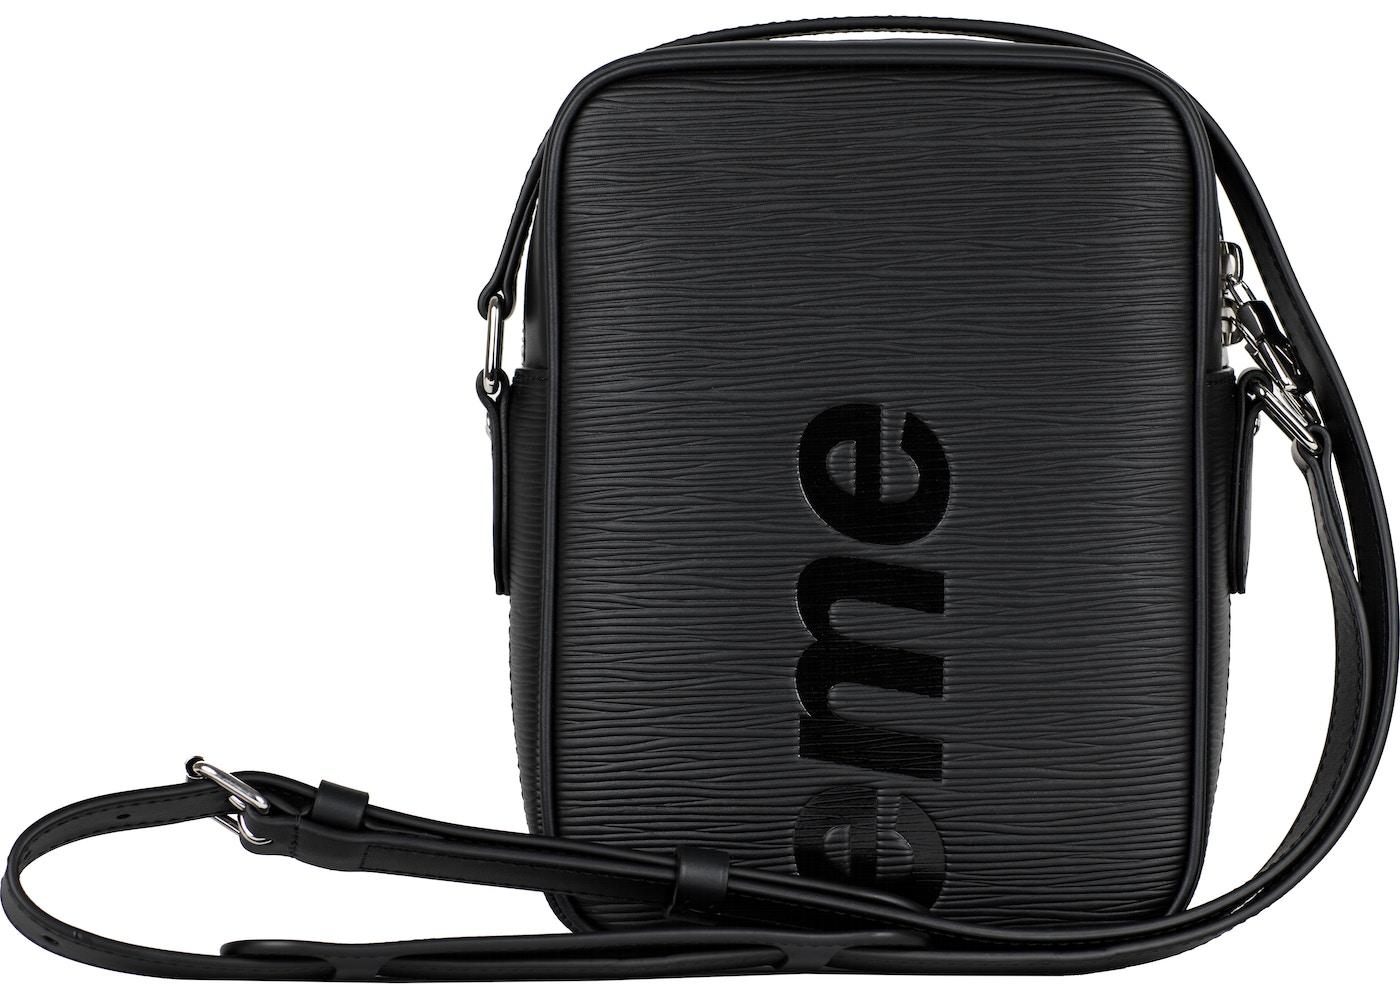 073e026150 Buy & Sell Luxury Handbags - New Lowest Asks